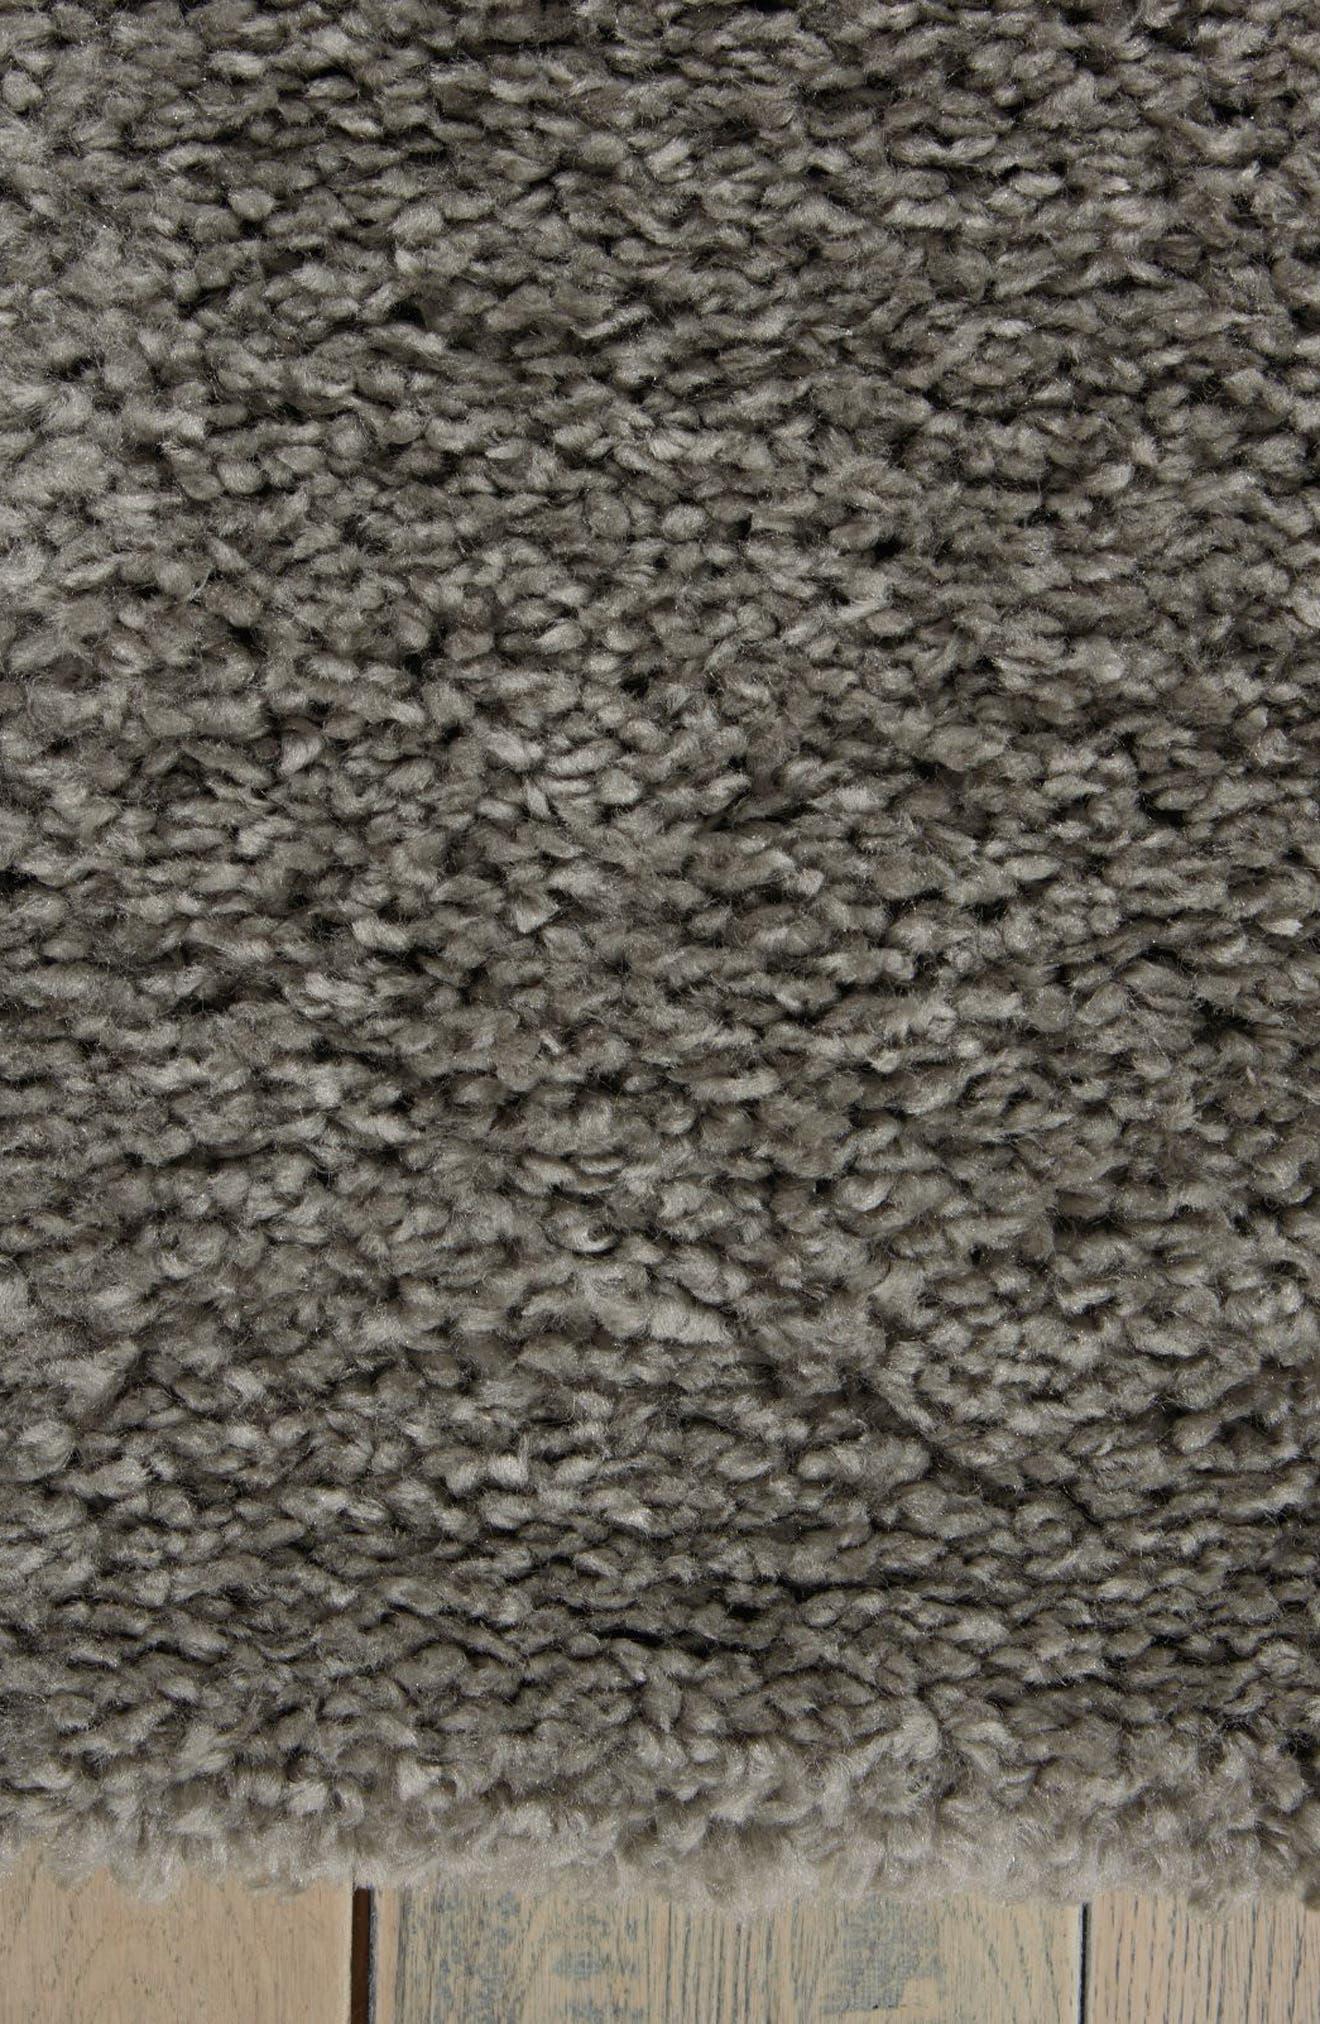 Riad Collection Shag Pile Area Rug,                             Alternate thumbnail 5, color,                             020